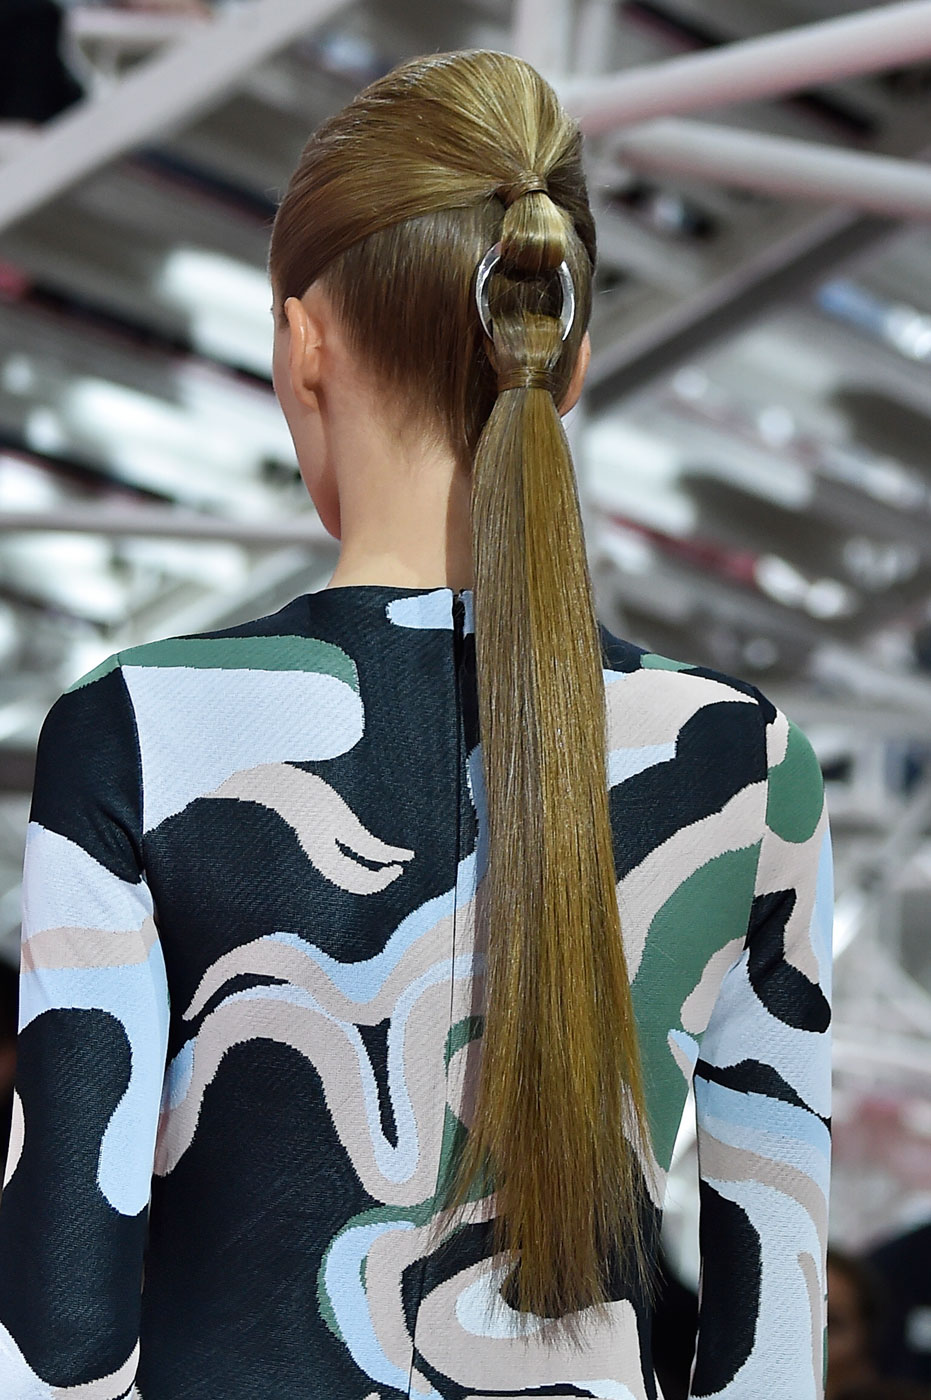 Christian-Dior-fashion-runway-show-close-ups-haute-couture-paris-spring-summer-2015-the-impression-046